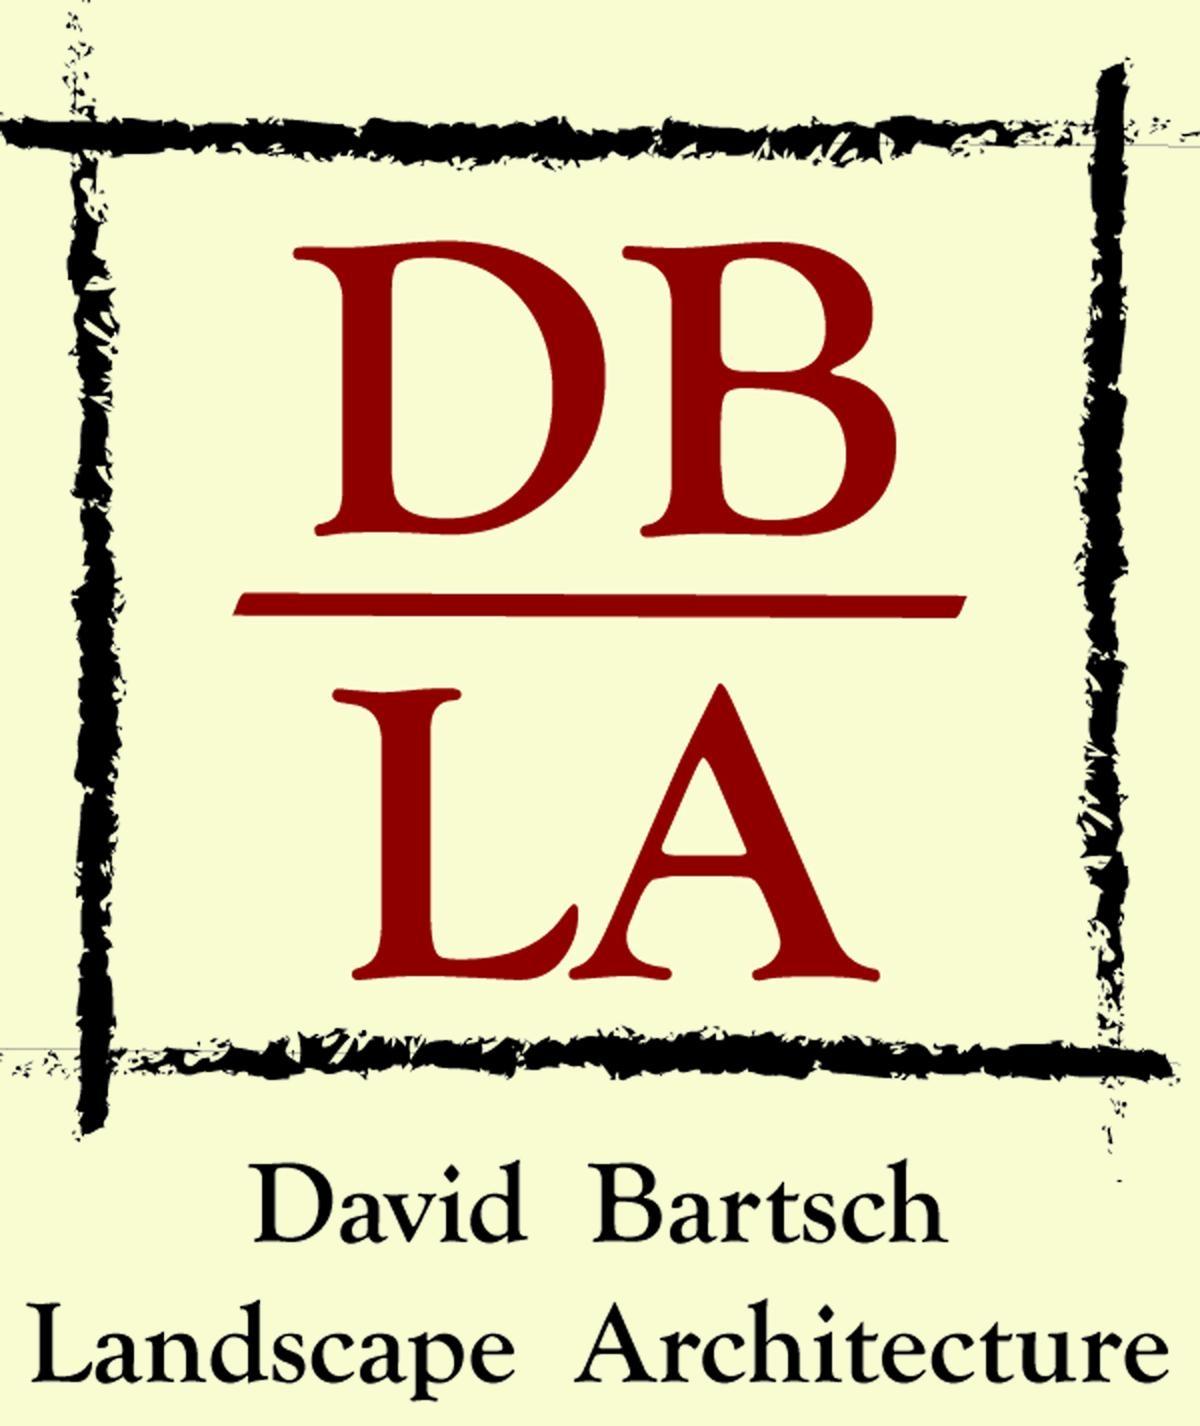 David Bartsch Landscape Architecture LLC - Cambridge, MA - Landscape Architects & Design